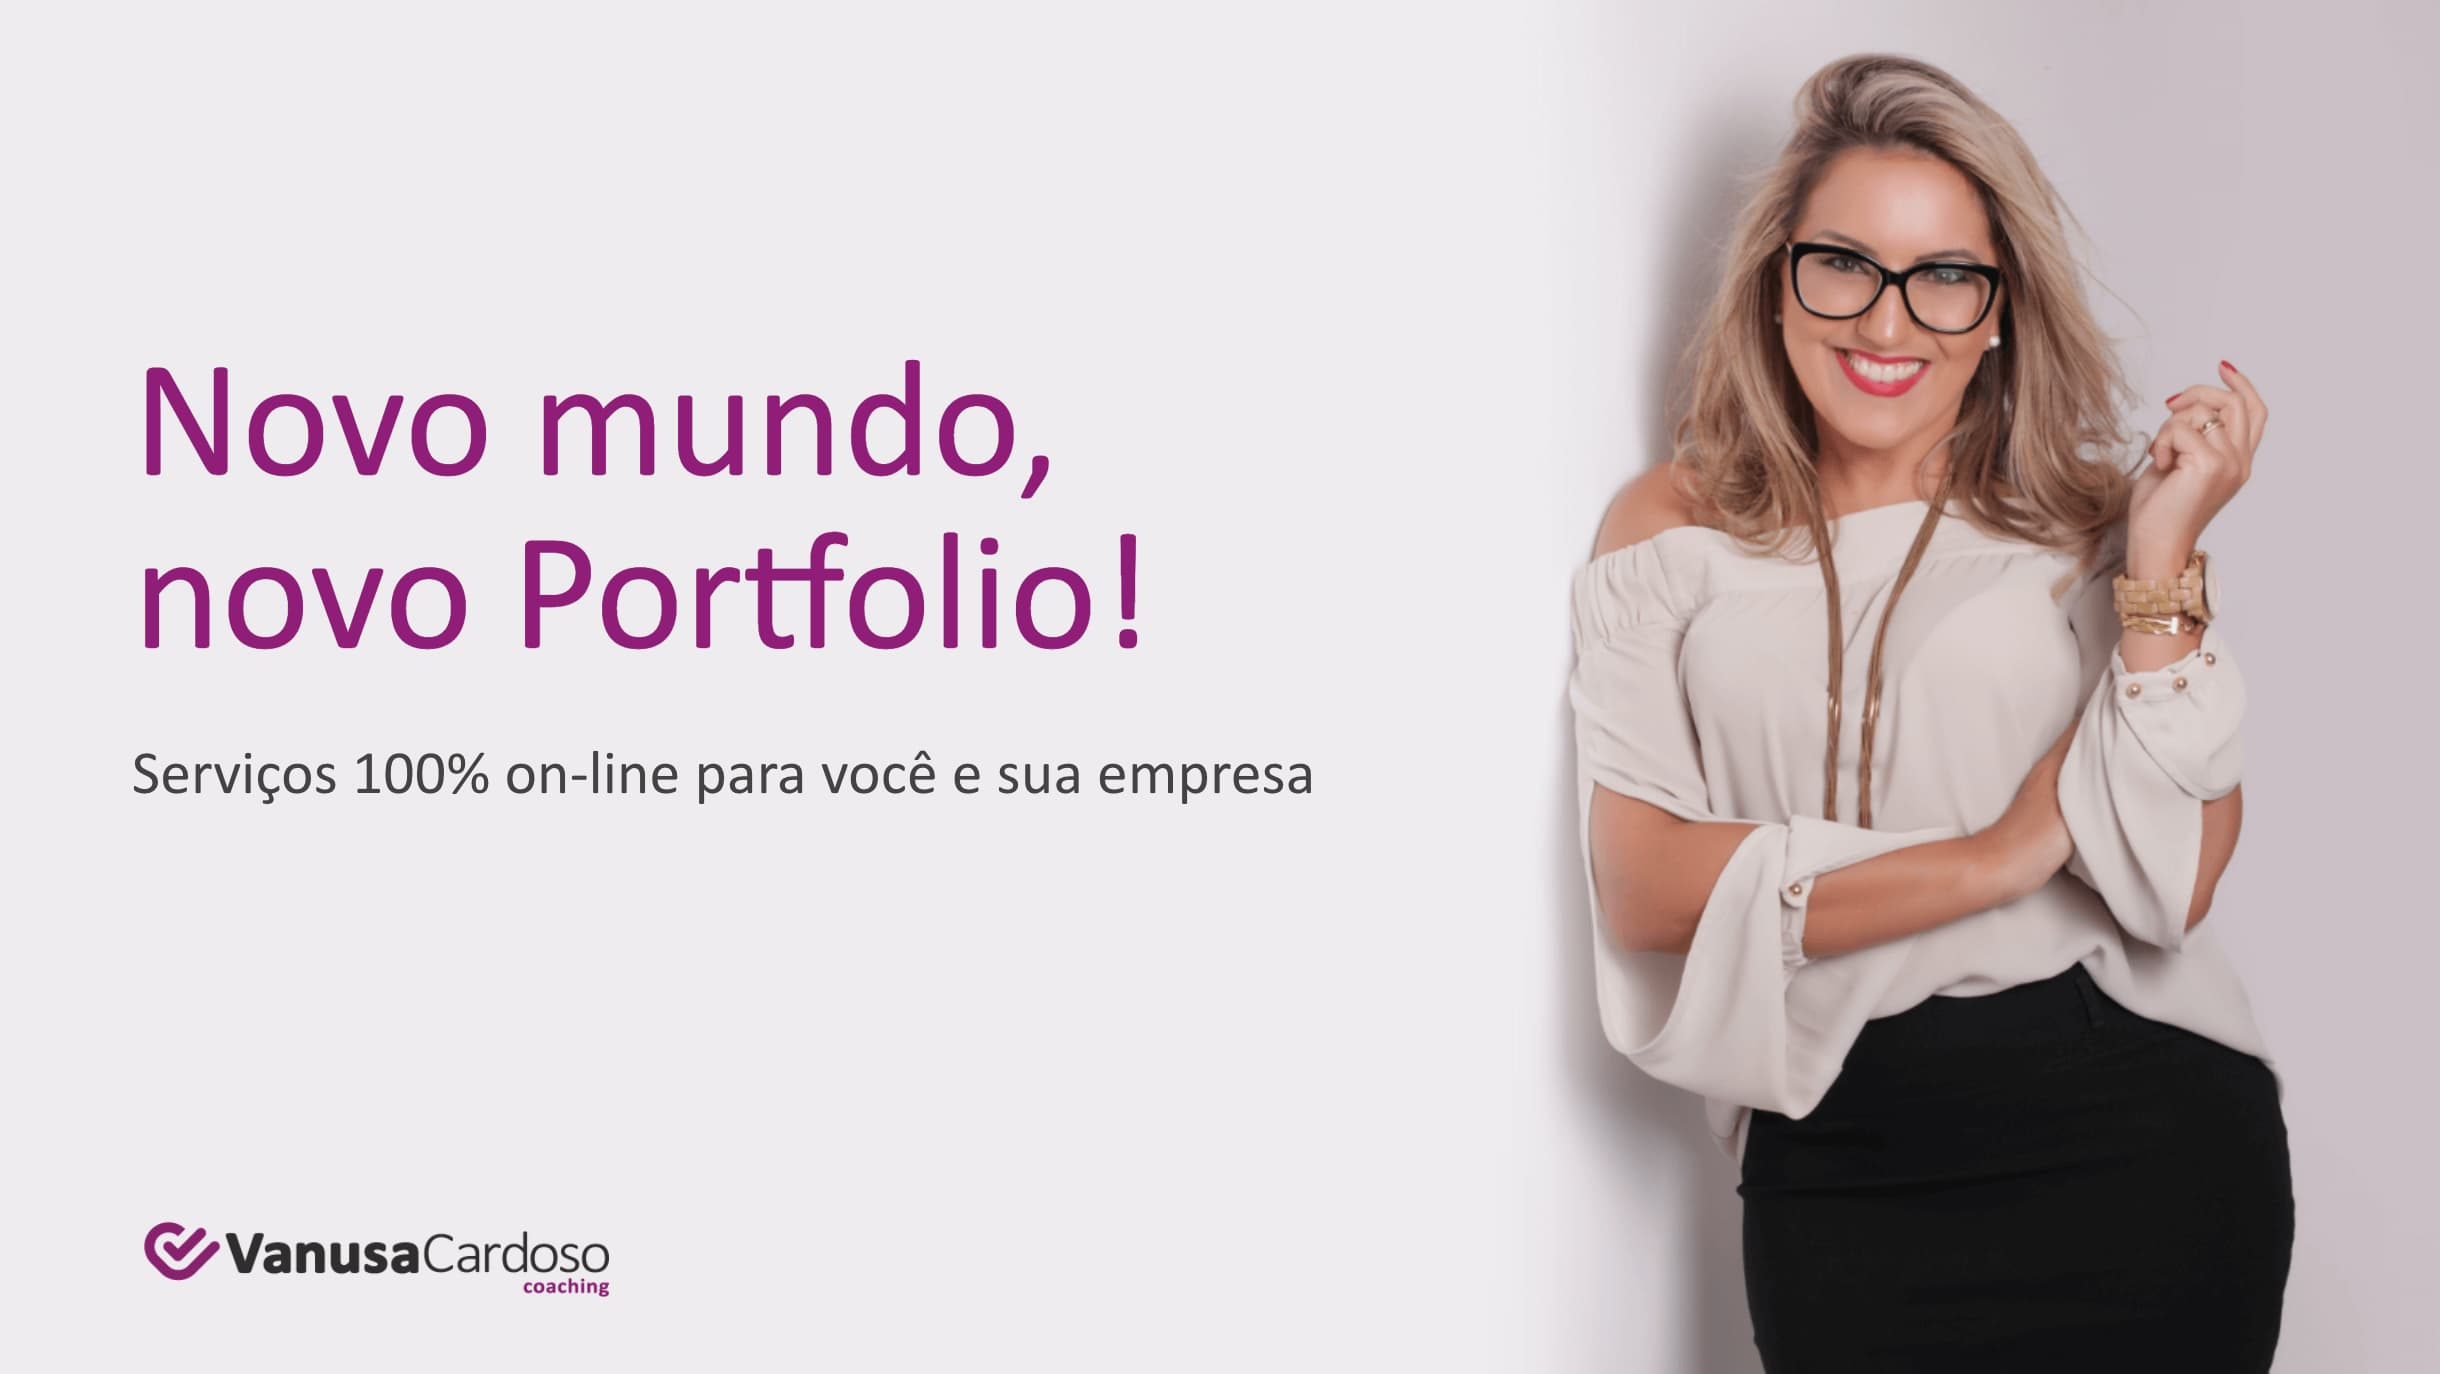 novo-mundo-novo-portfolio